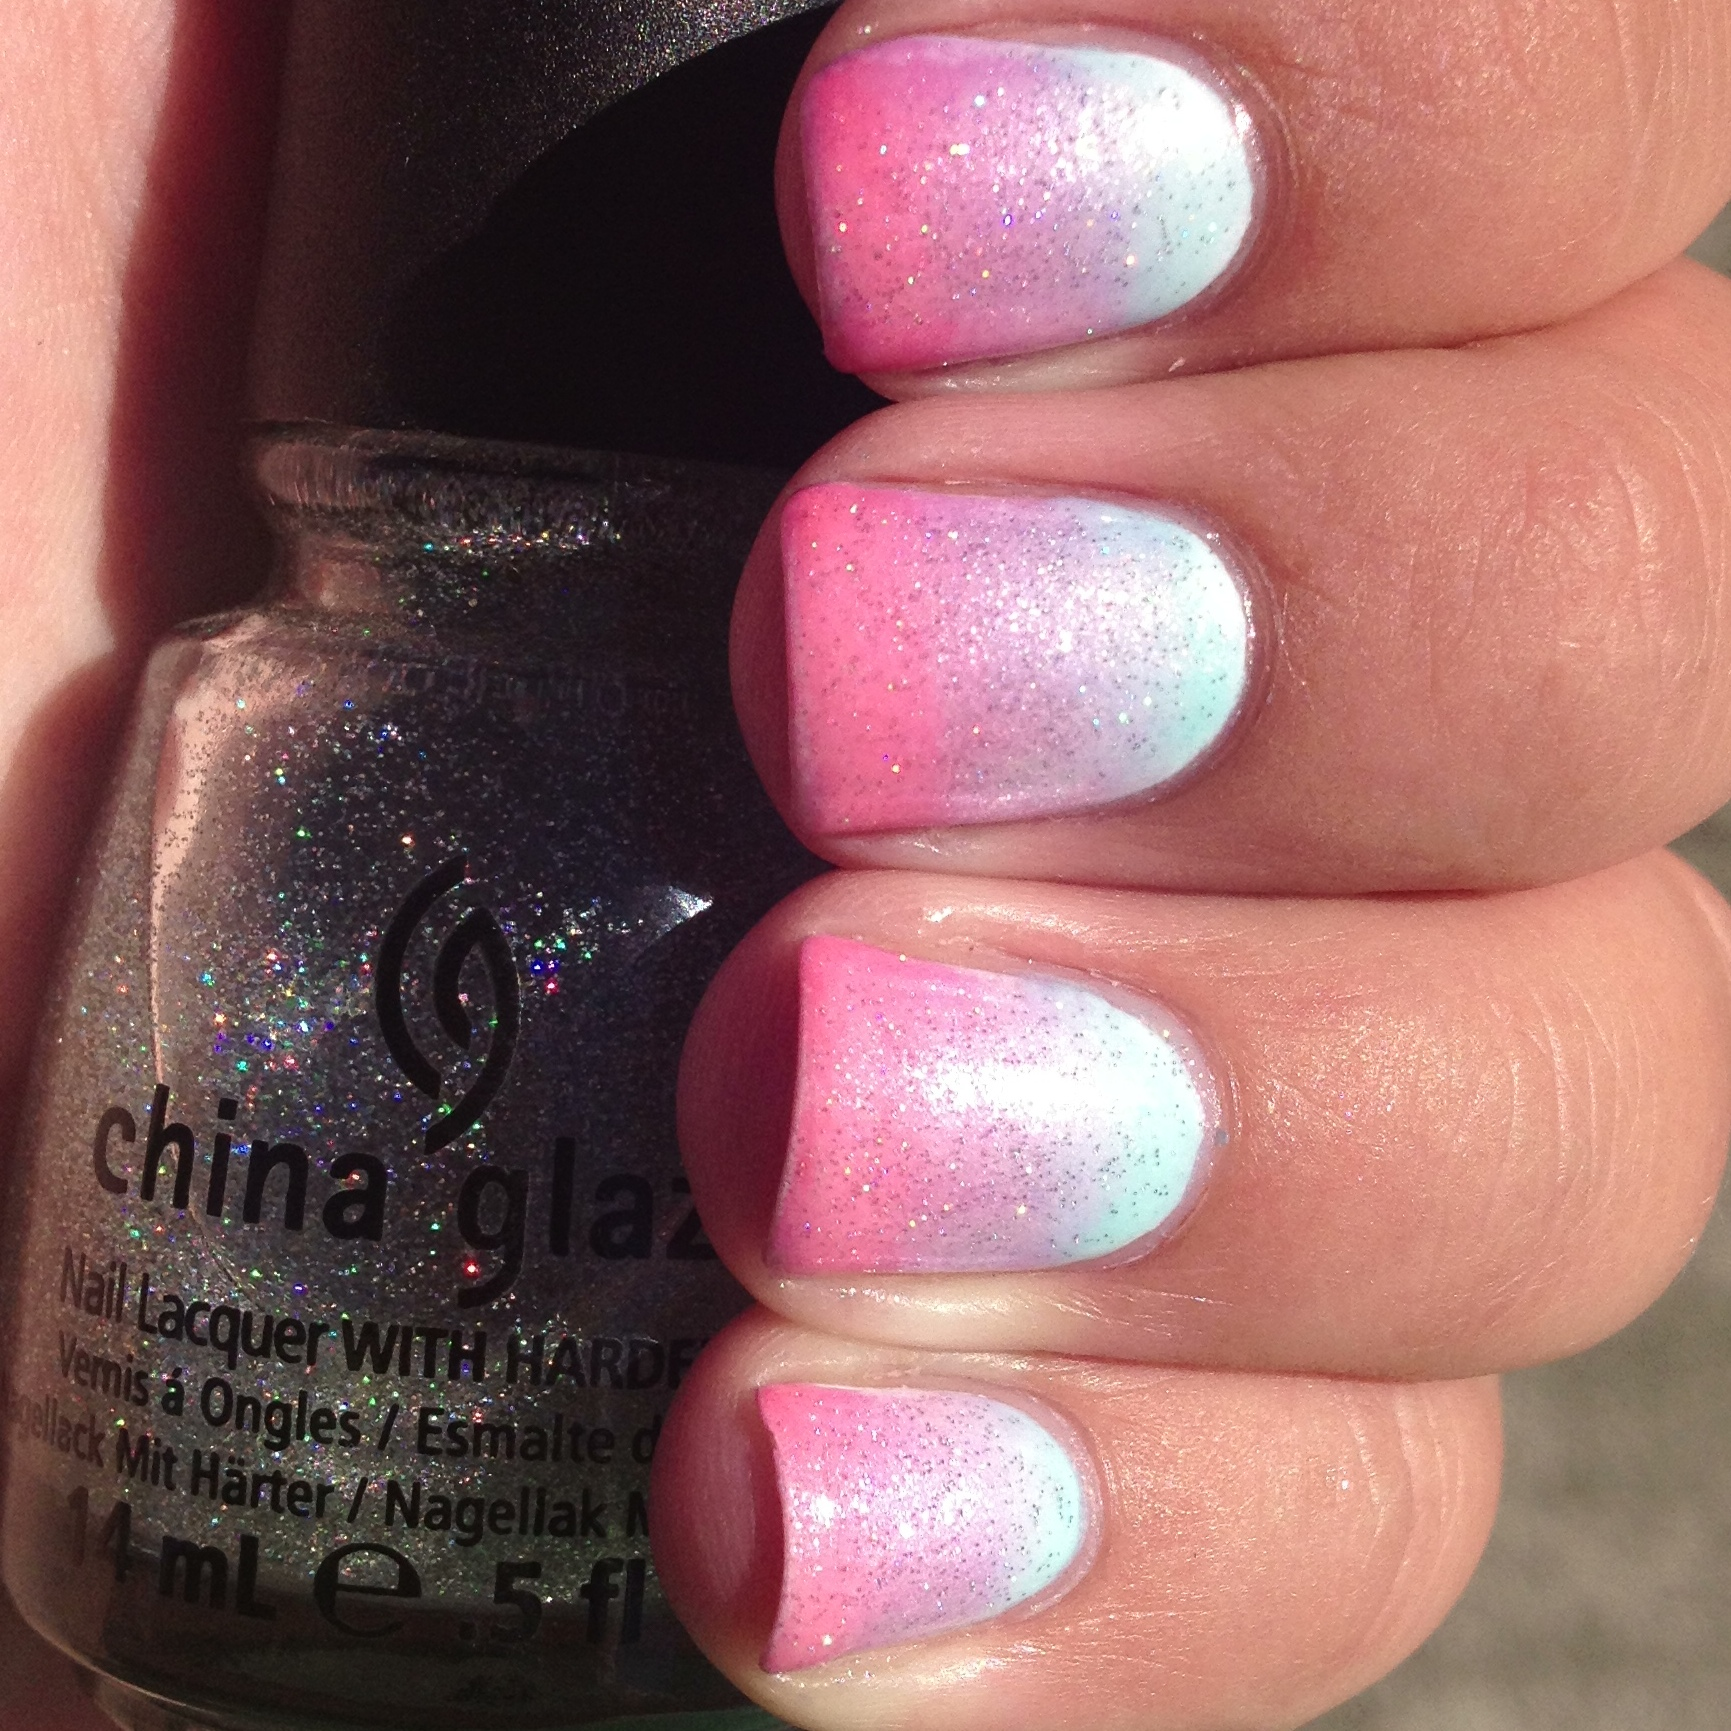 Baby Girl Pink Nail Polish To Bend Light